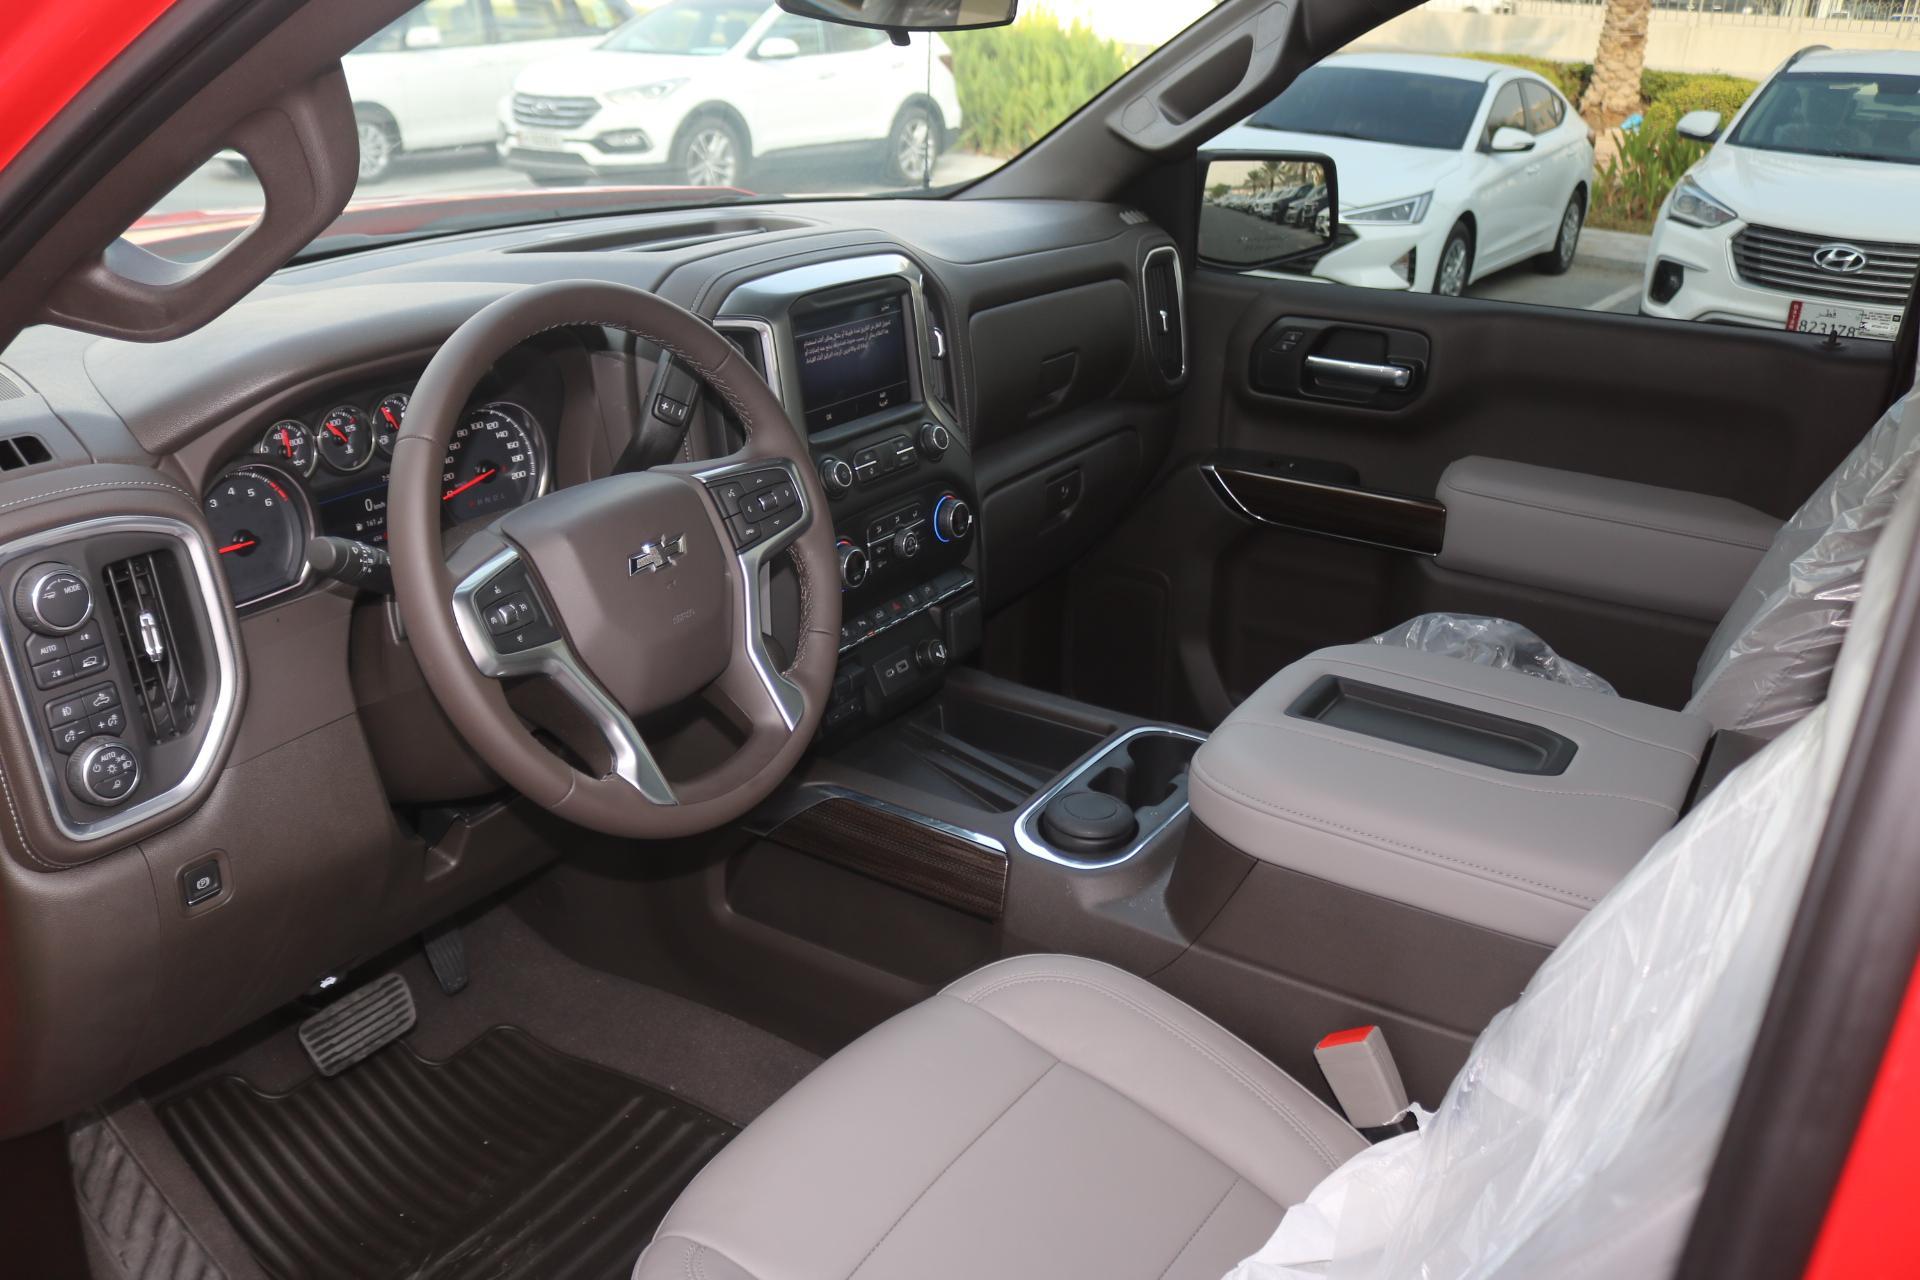 Chevrolet Silverado  - RST   5.3 L  / 2020